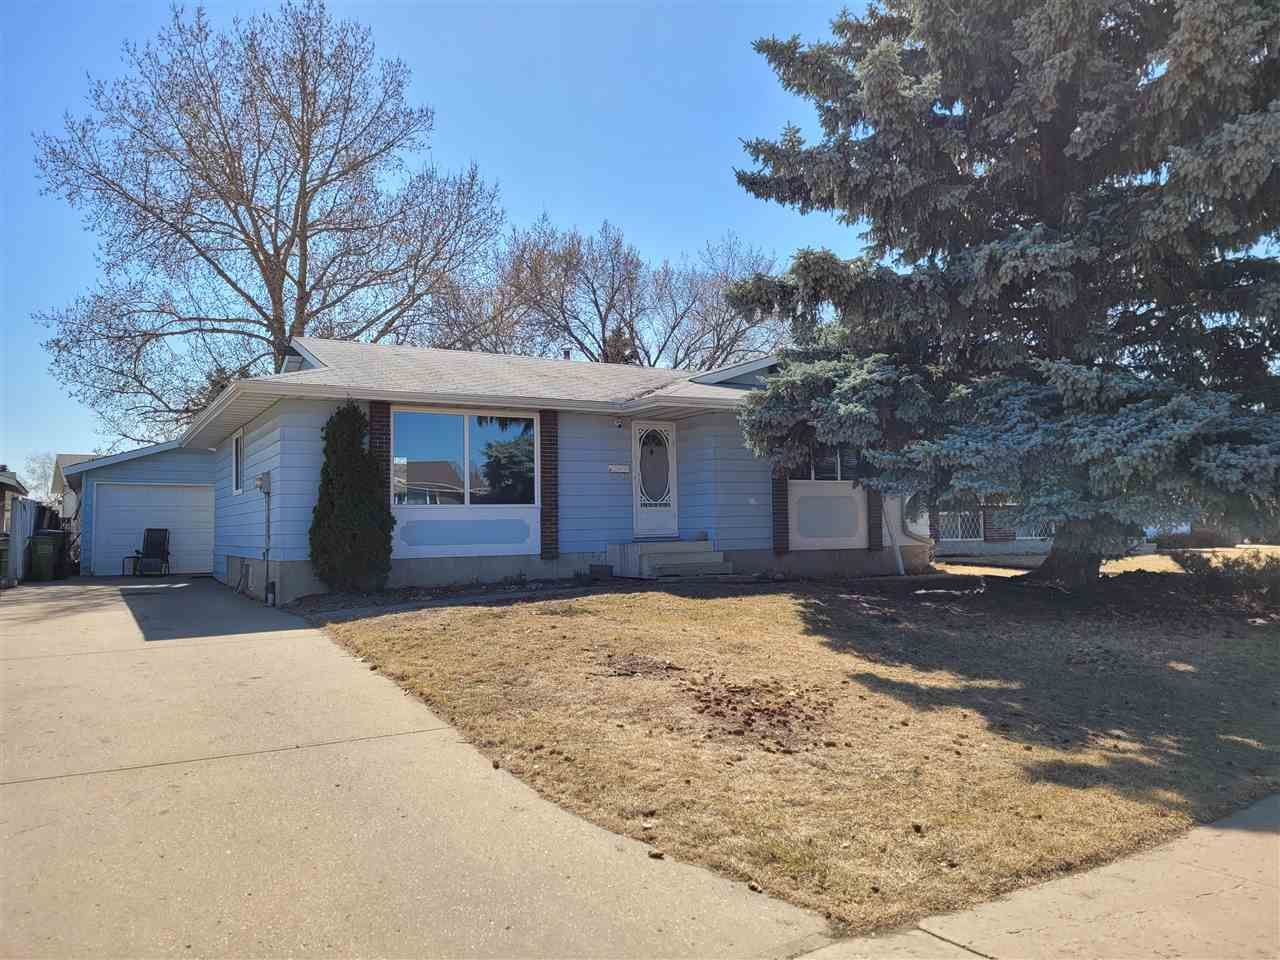 Main Photo: 3419 136 Avenue in Edmonton: Zone 35 House for sale : MLS®# E4241717